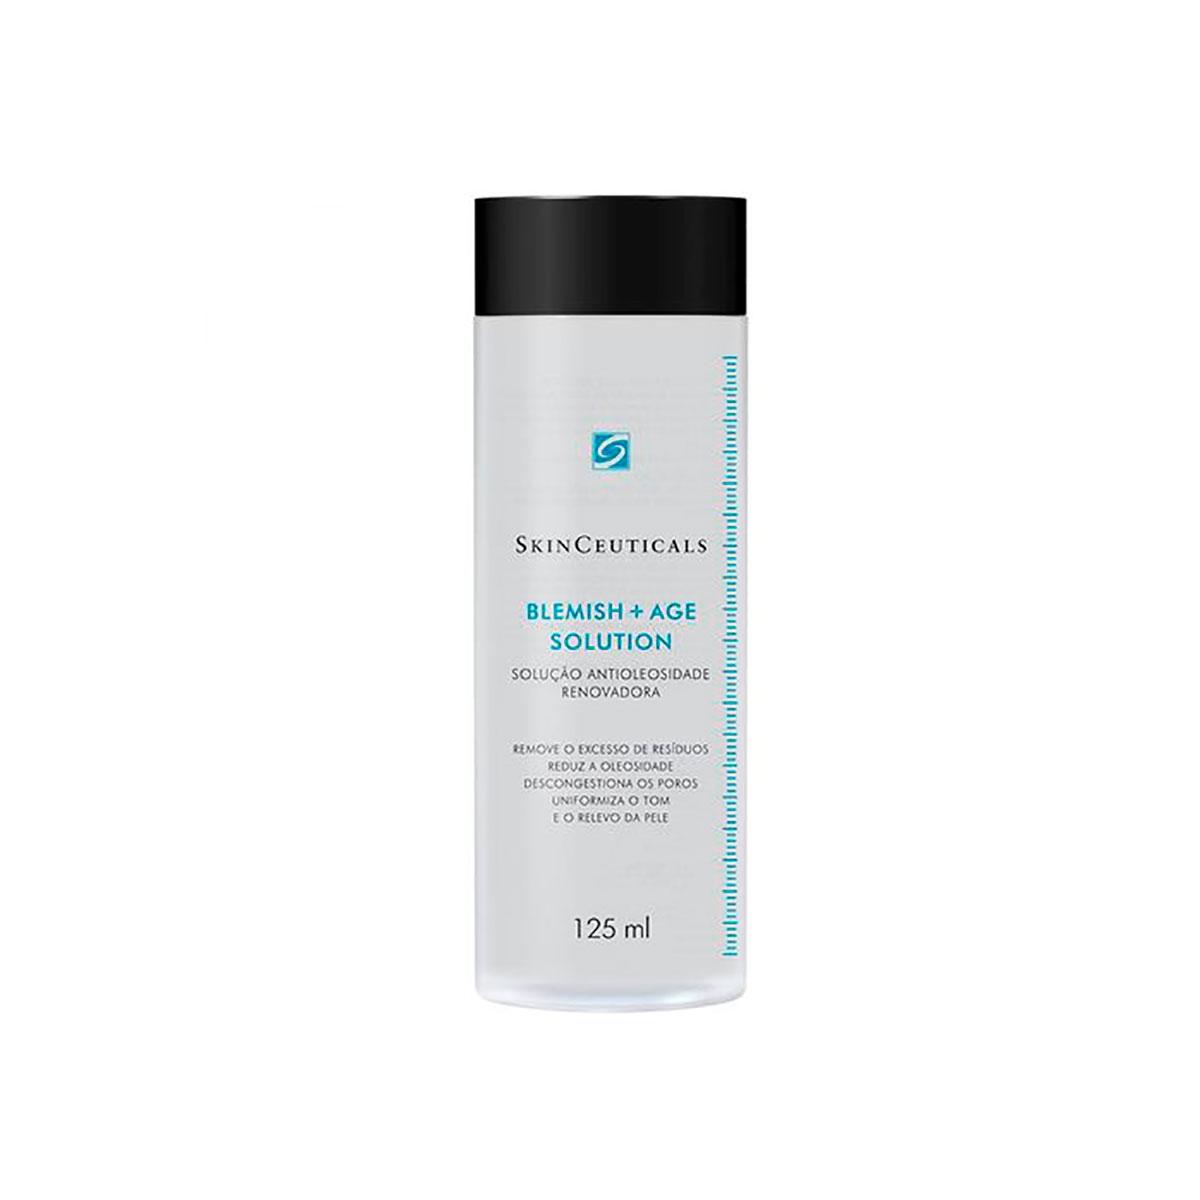 Skinceuticals Tônico Facial Blemish + Age Solution com 125ml 125ml